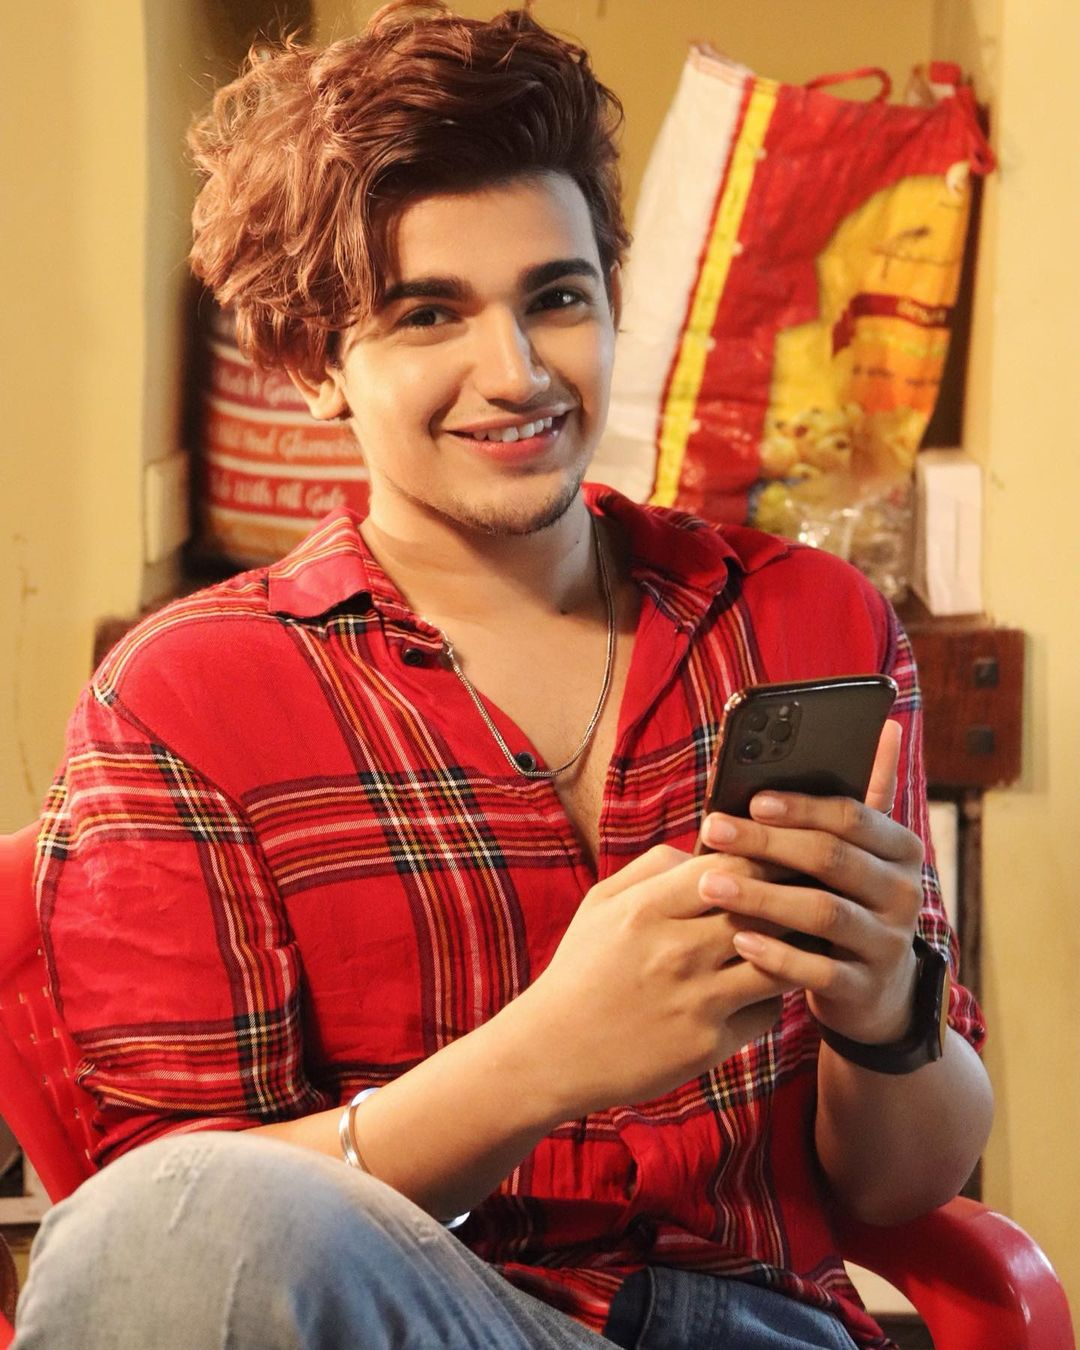 vishal pandey pic download, vishal pandey wallpaper download, vishal pandey childhood photos, vishal pandey ki photos